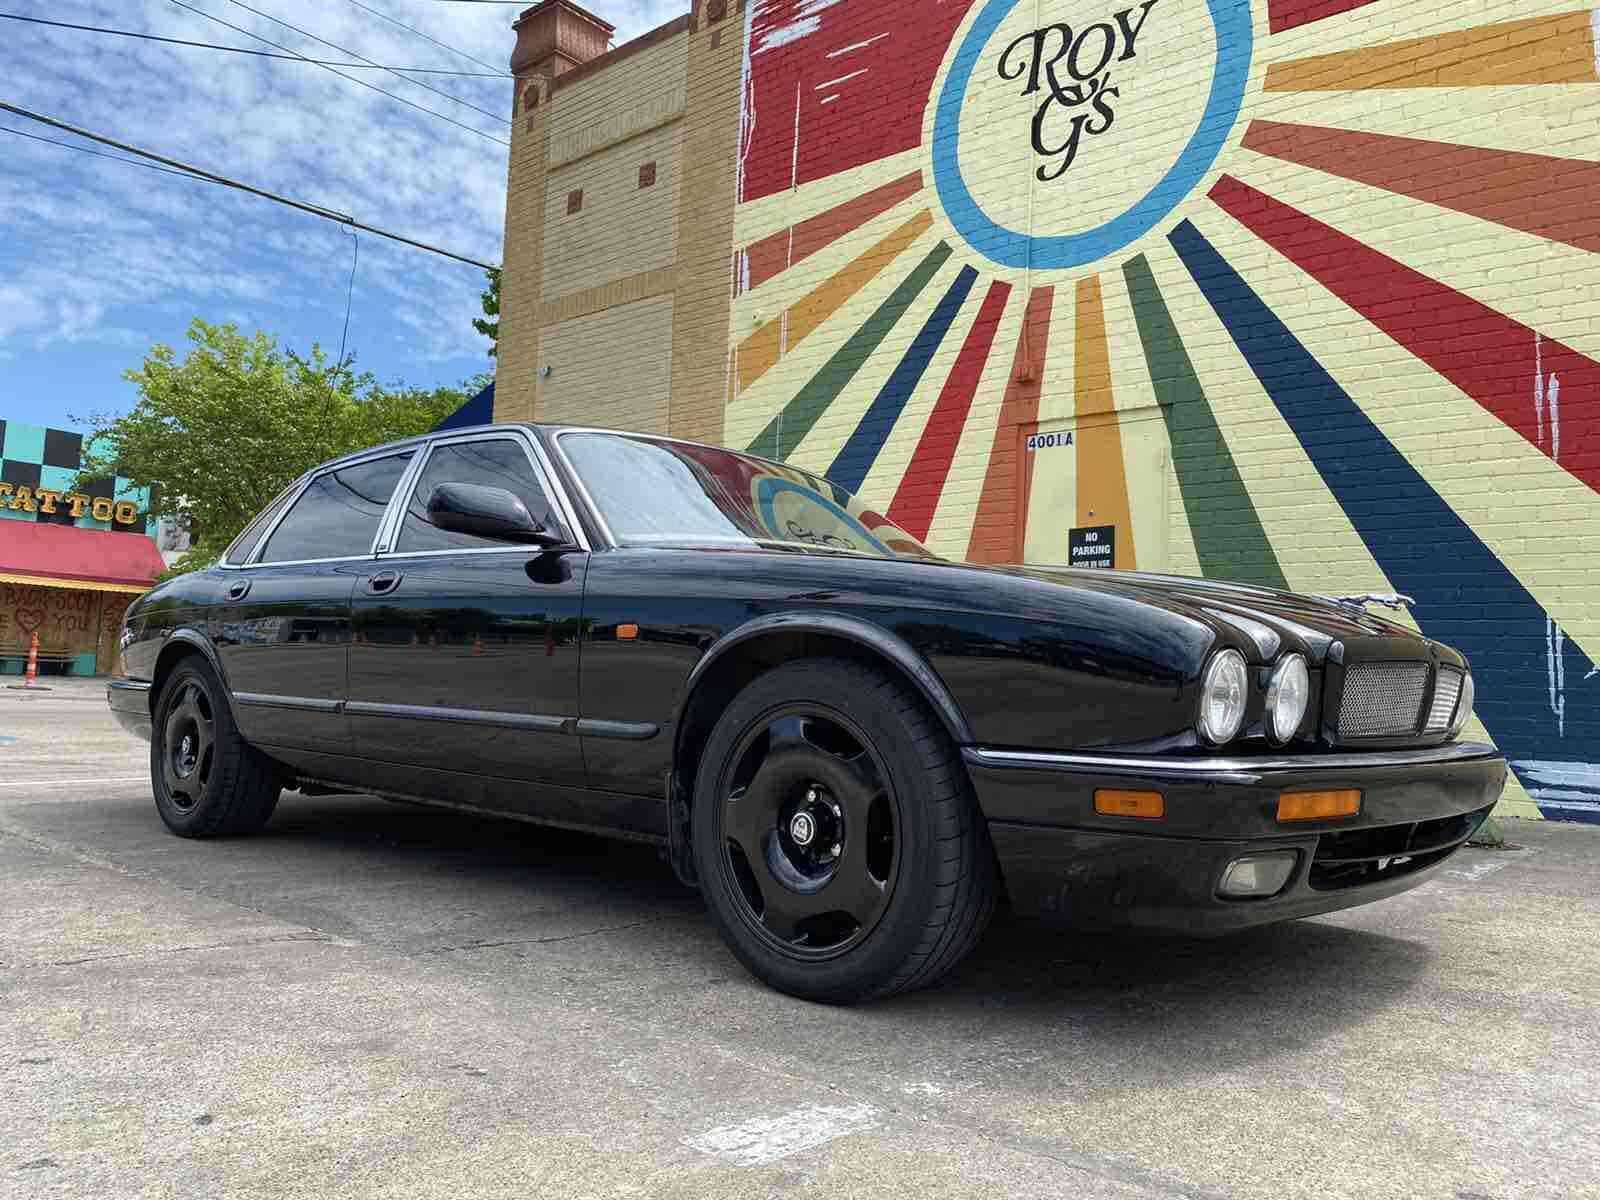 BESPOKE CAR BROKER'S TOP 5 FINDS OF THE WEEK